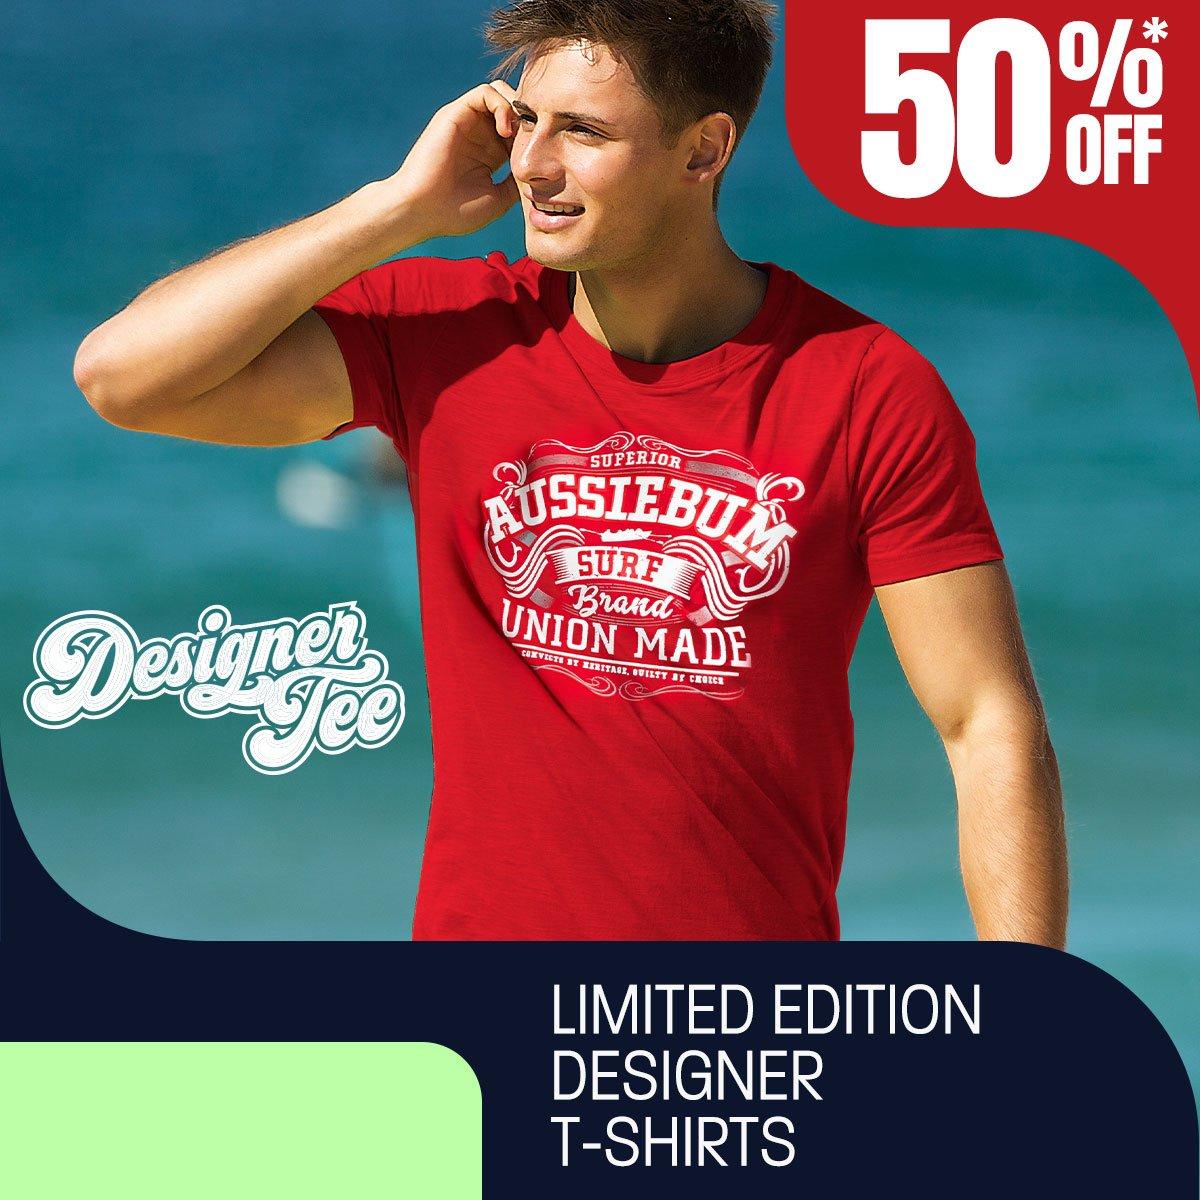 Designer Tee Union Red Homepage Image